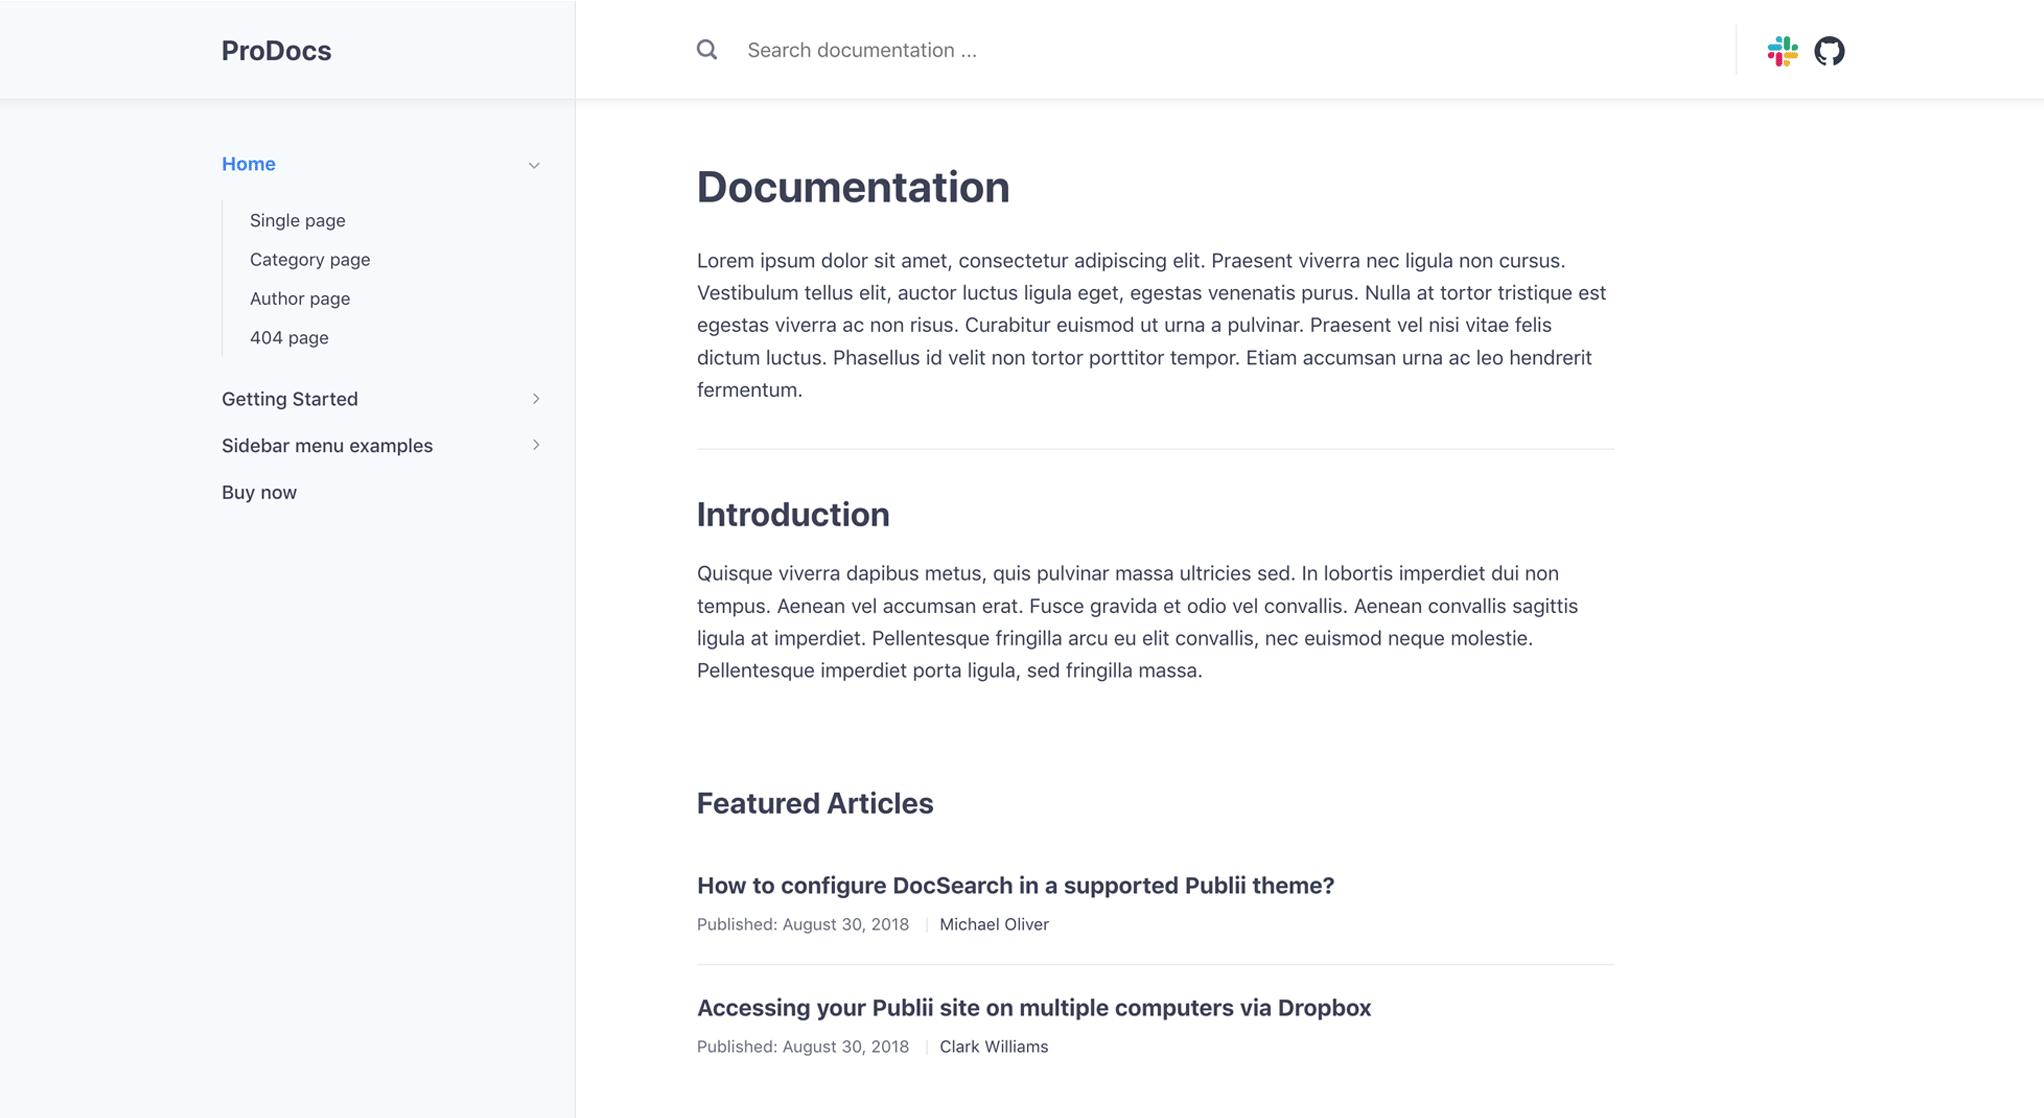 ProDocs theme category layout